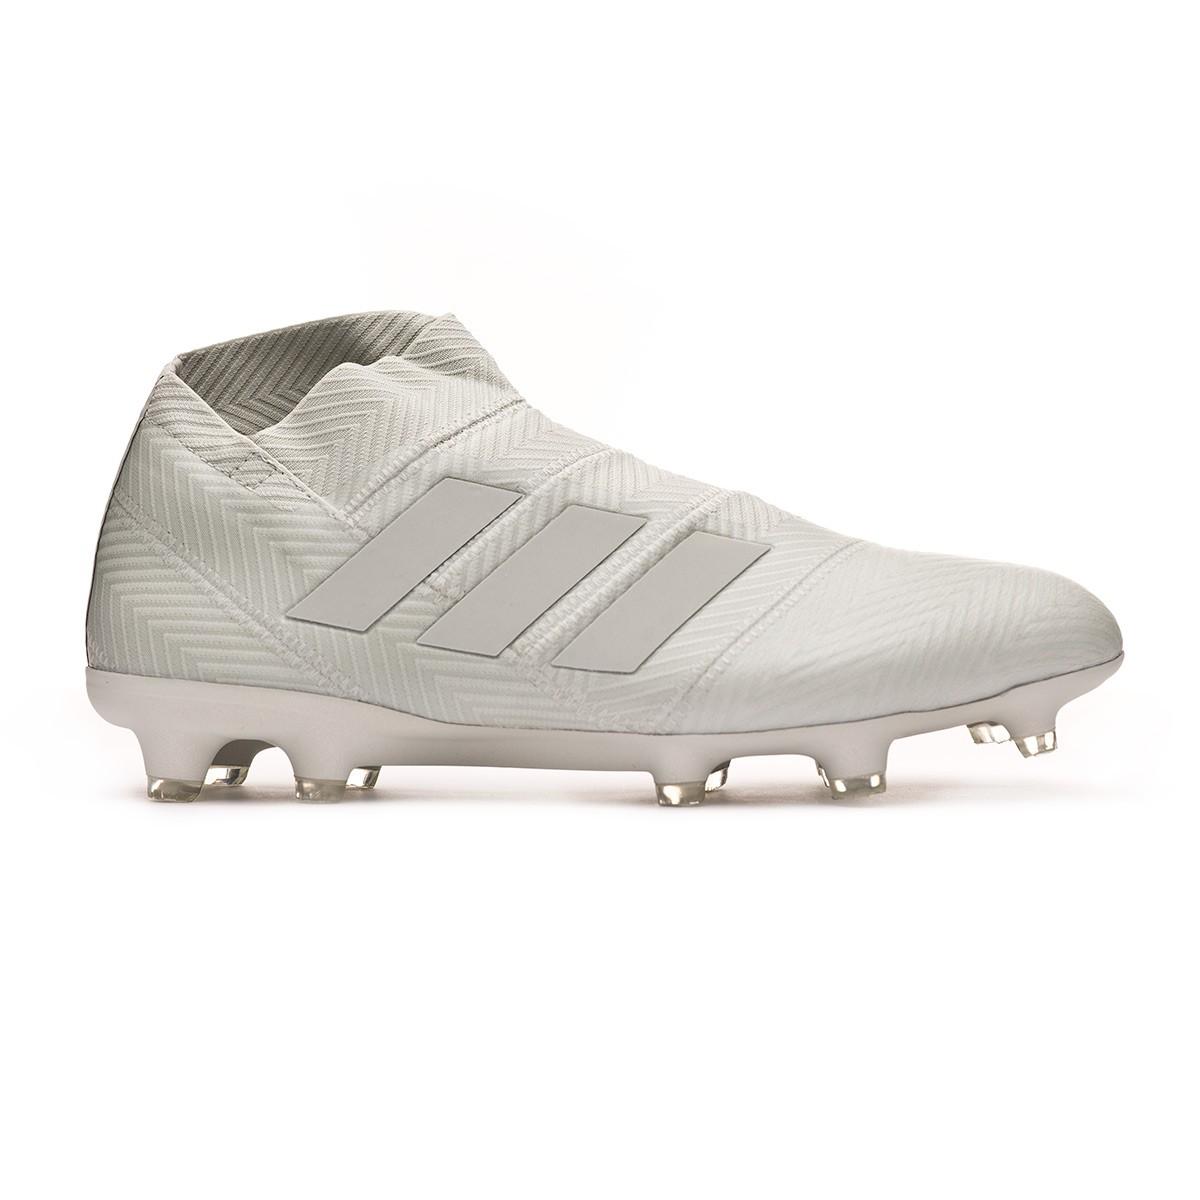 7268e783b59e Football Boots adidas Nemeziz 18+ FG Ash silver-White tint - Football store  Fútbol Emotion